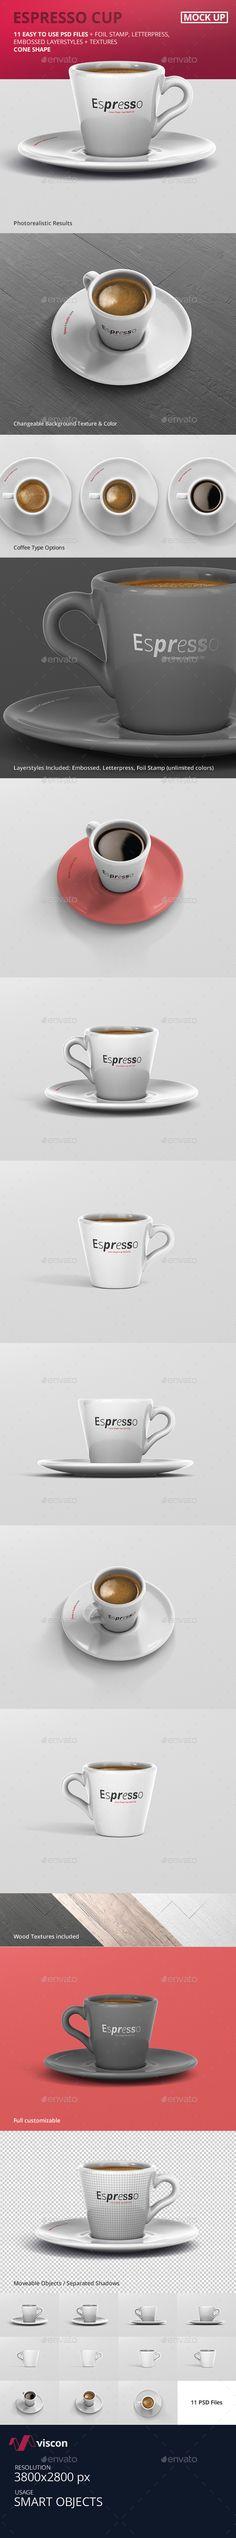 Espresso Cup Mockup - Cone Shape by visconbiz High resolution Cone Shaped Espresso Cup MockupFully customizable espresso / coffee cup mockup to present your design in seconds.